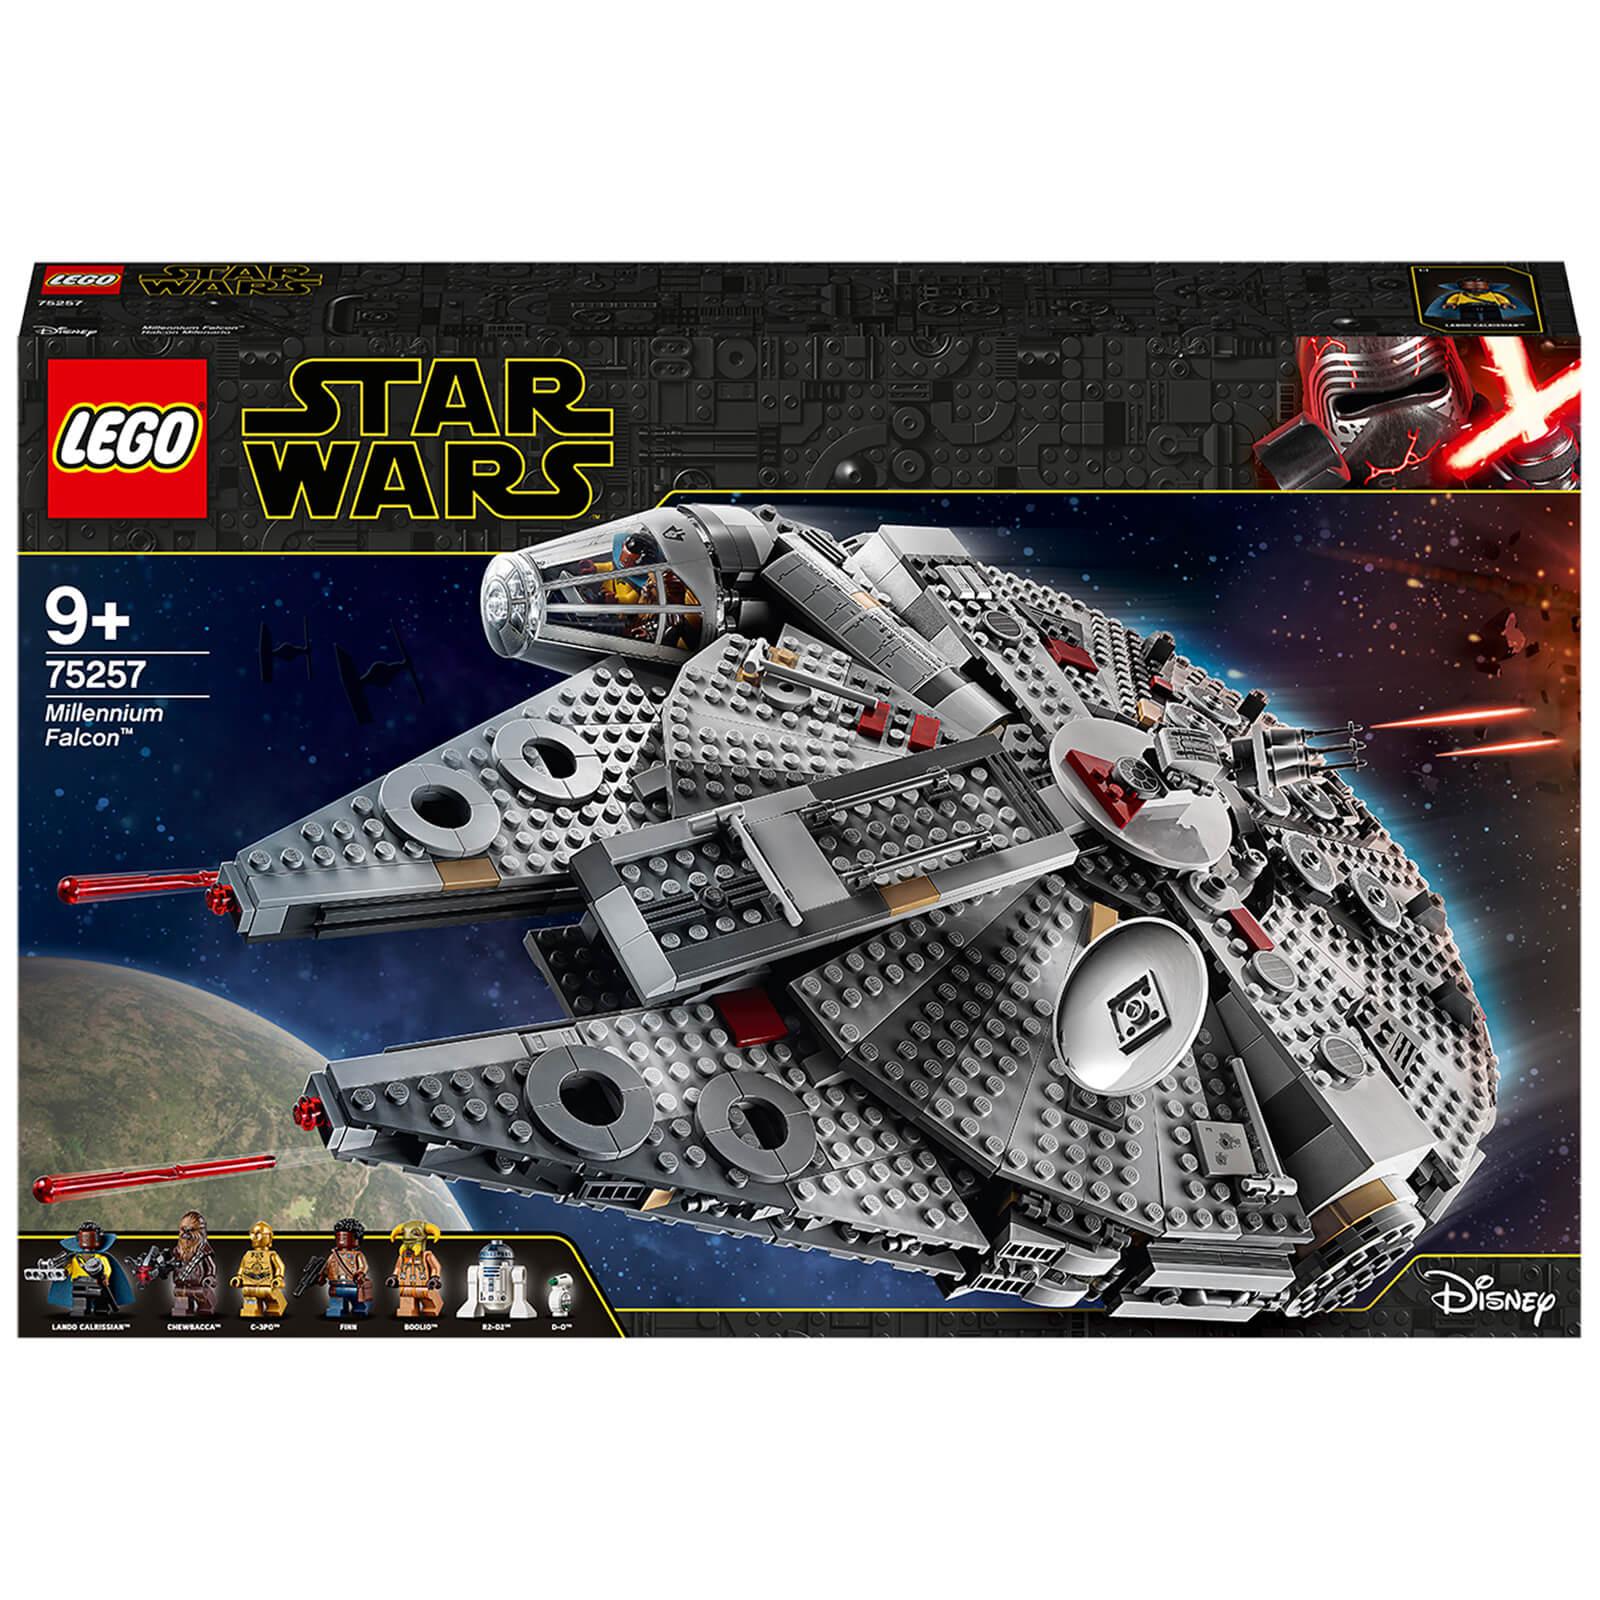 Image of LEGO Star Wars: Millennium Falcon Building Set (75257)